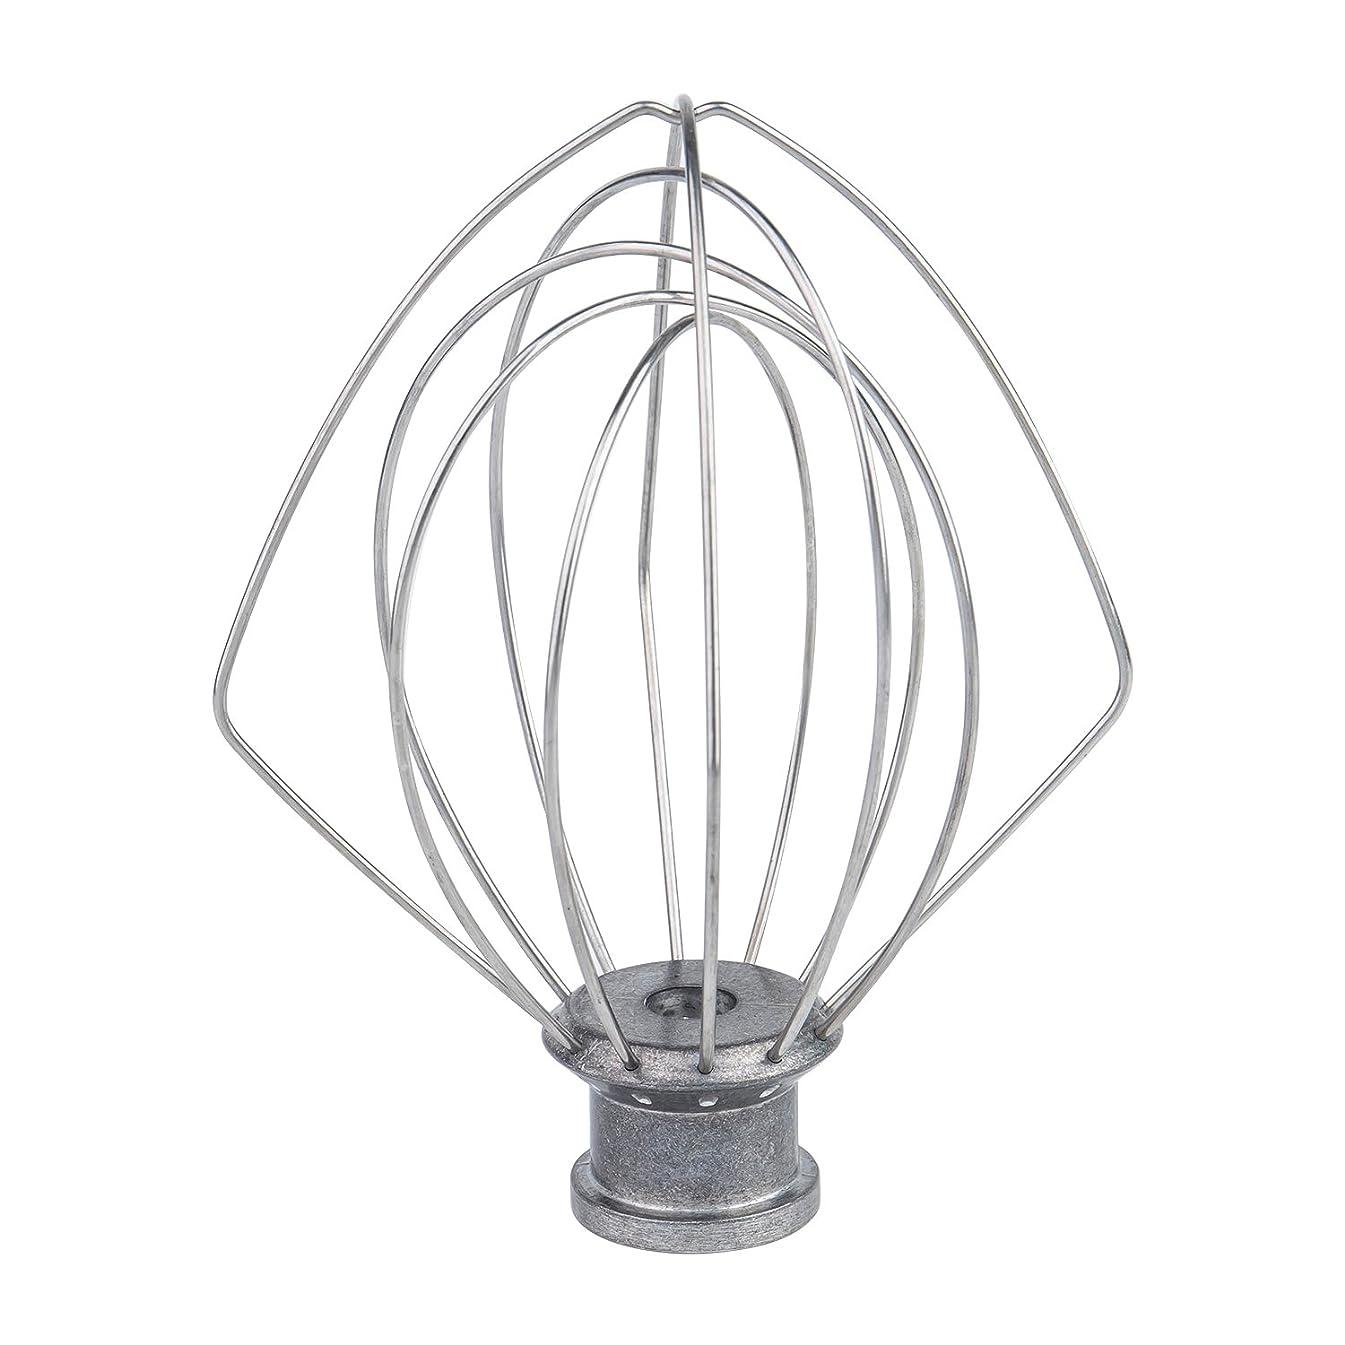 PAKIMARK K45WW Wire Whip for Tilt-Head Stand Mixer for KitchenAid, Stainless Steel Egg Cream Stirrer, Flour Cake Balloon Whisk, Easy for Kitchen and Life